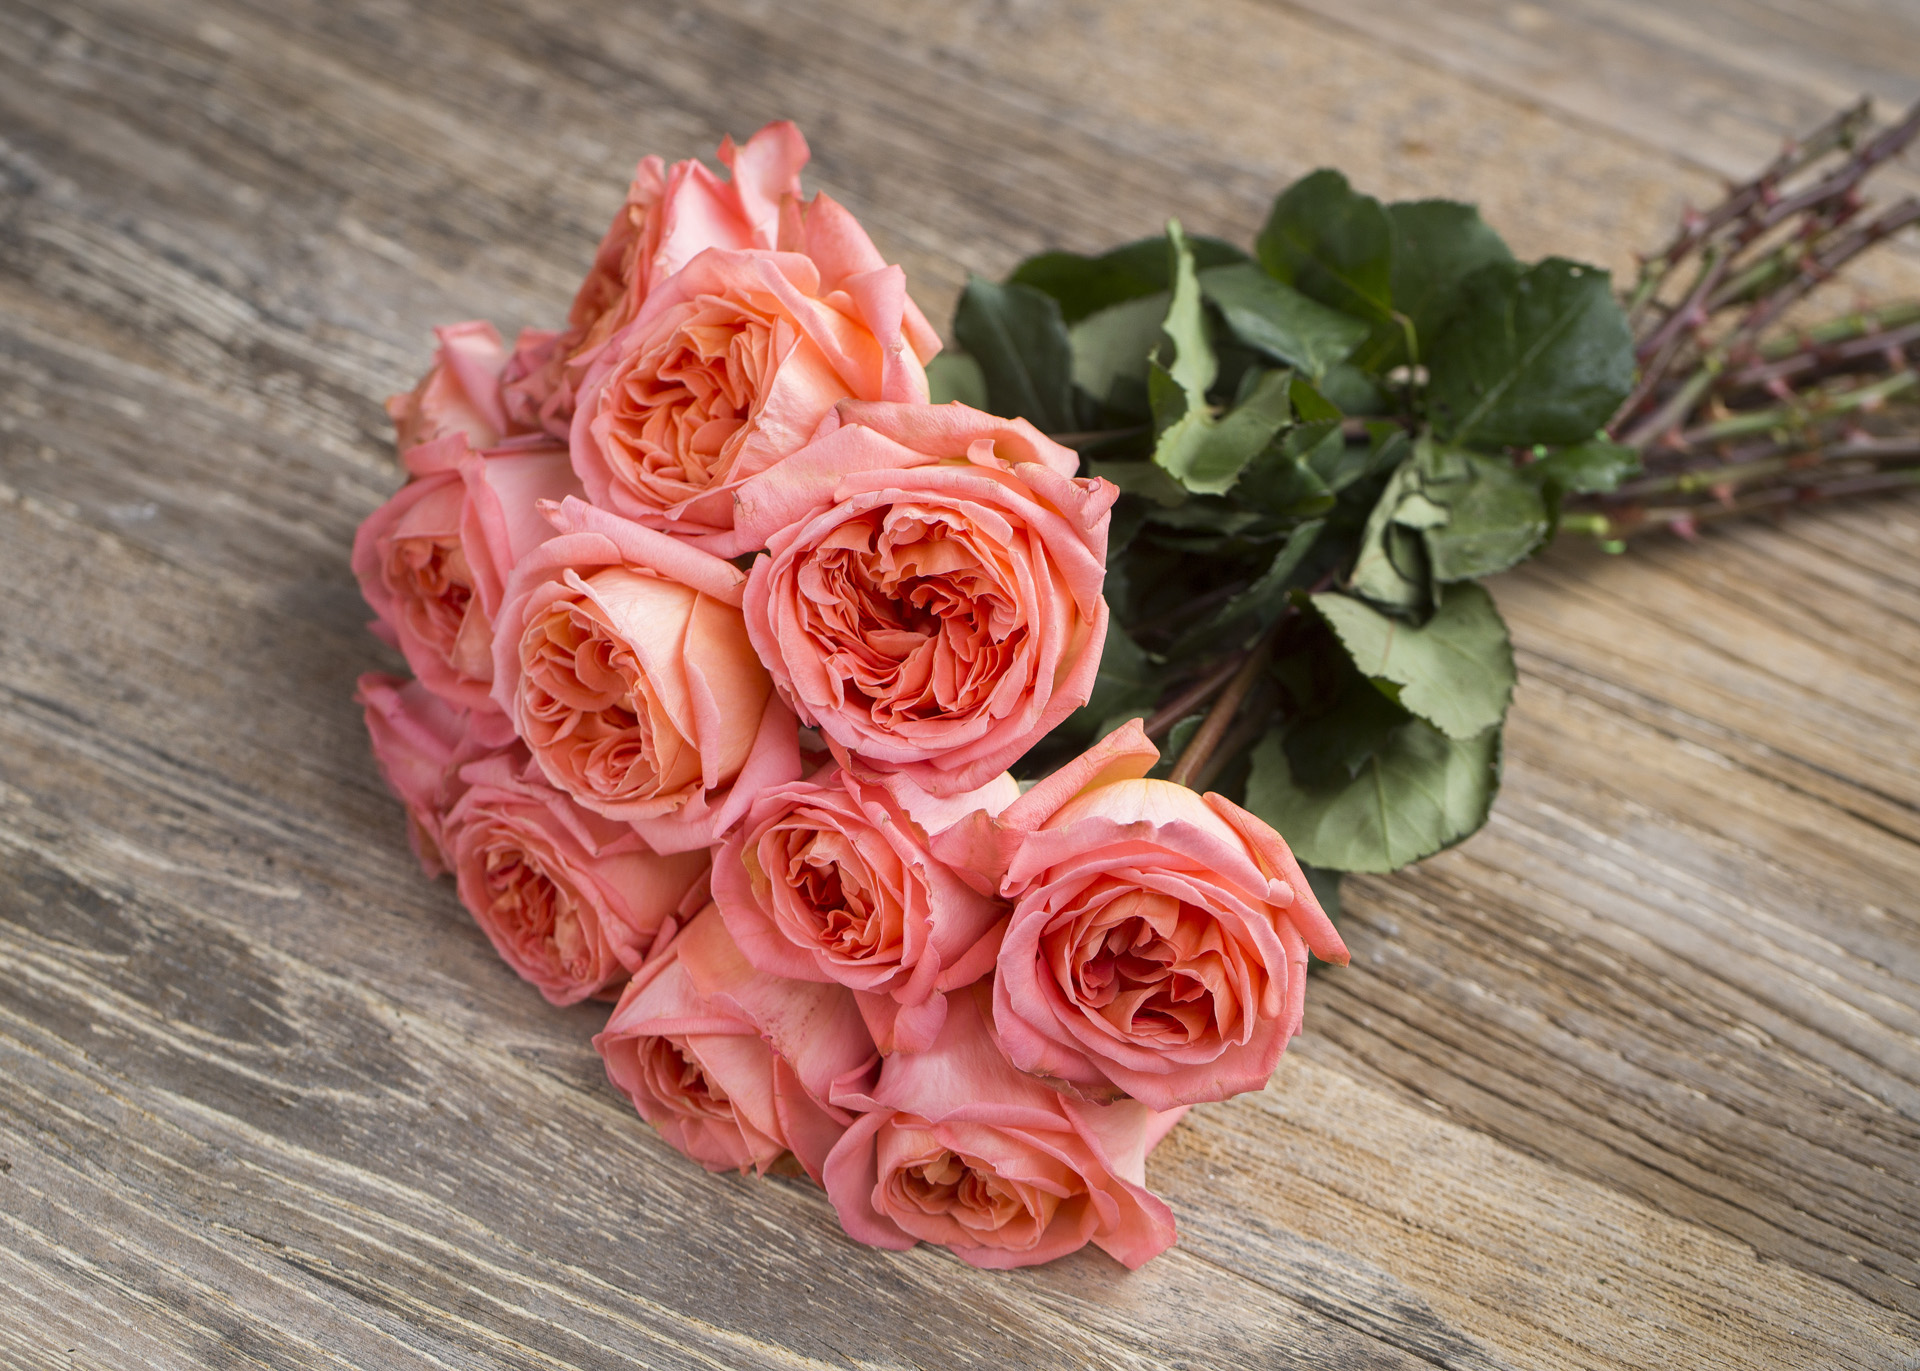 Meilland Jardin & Parfum Rose Rene Goscinny